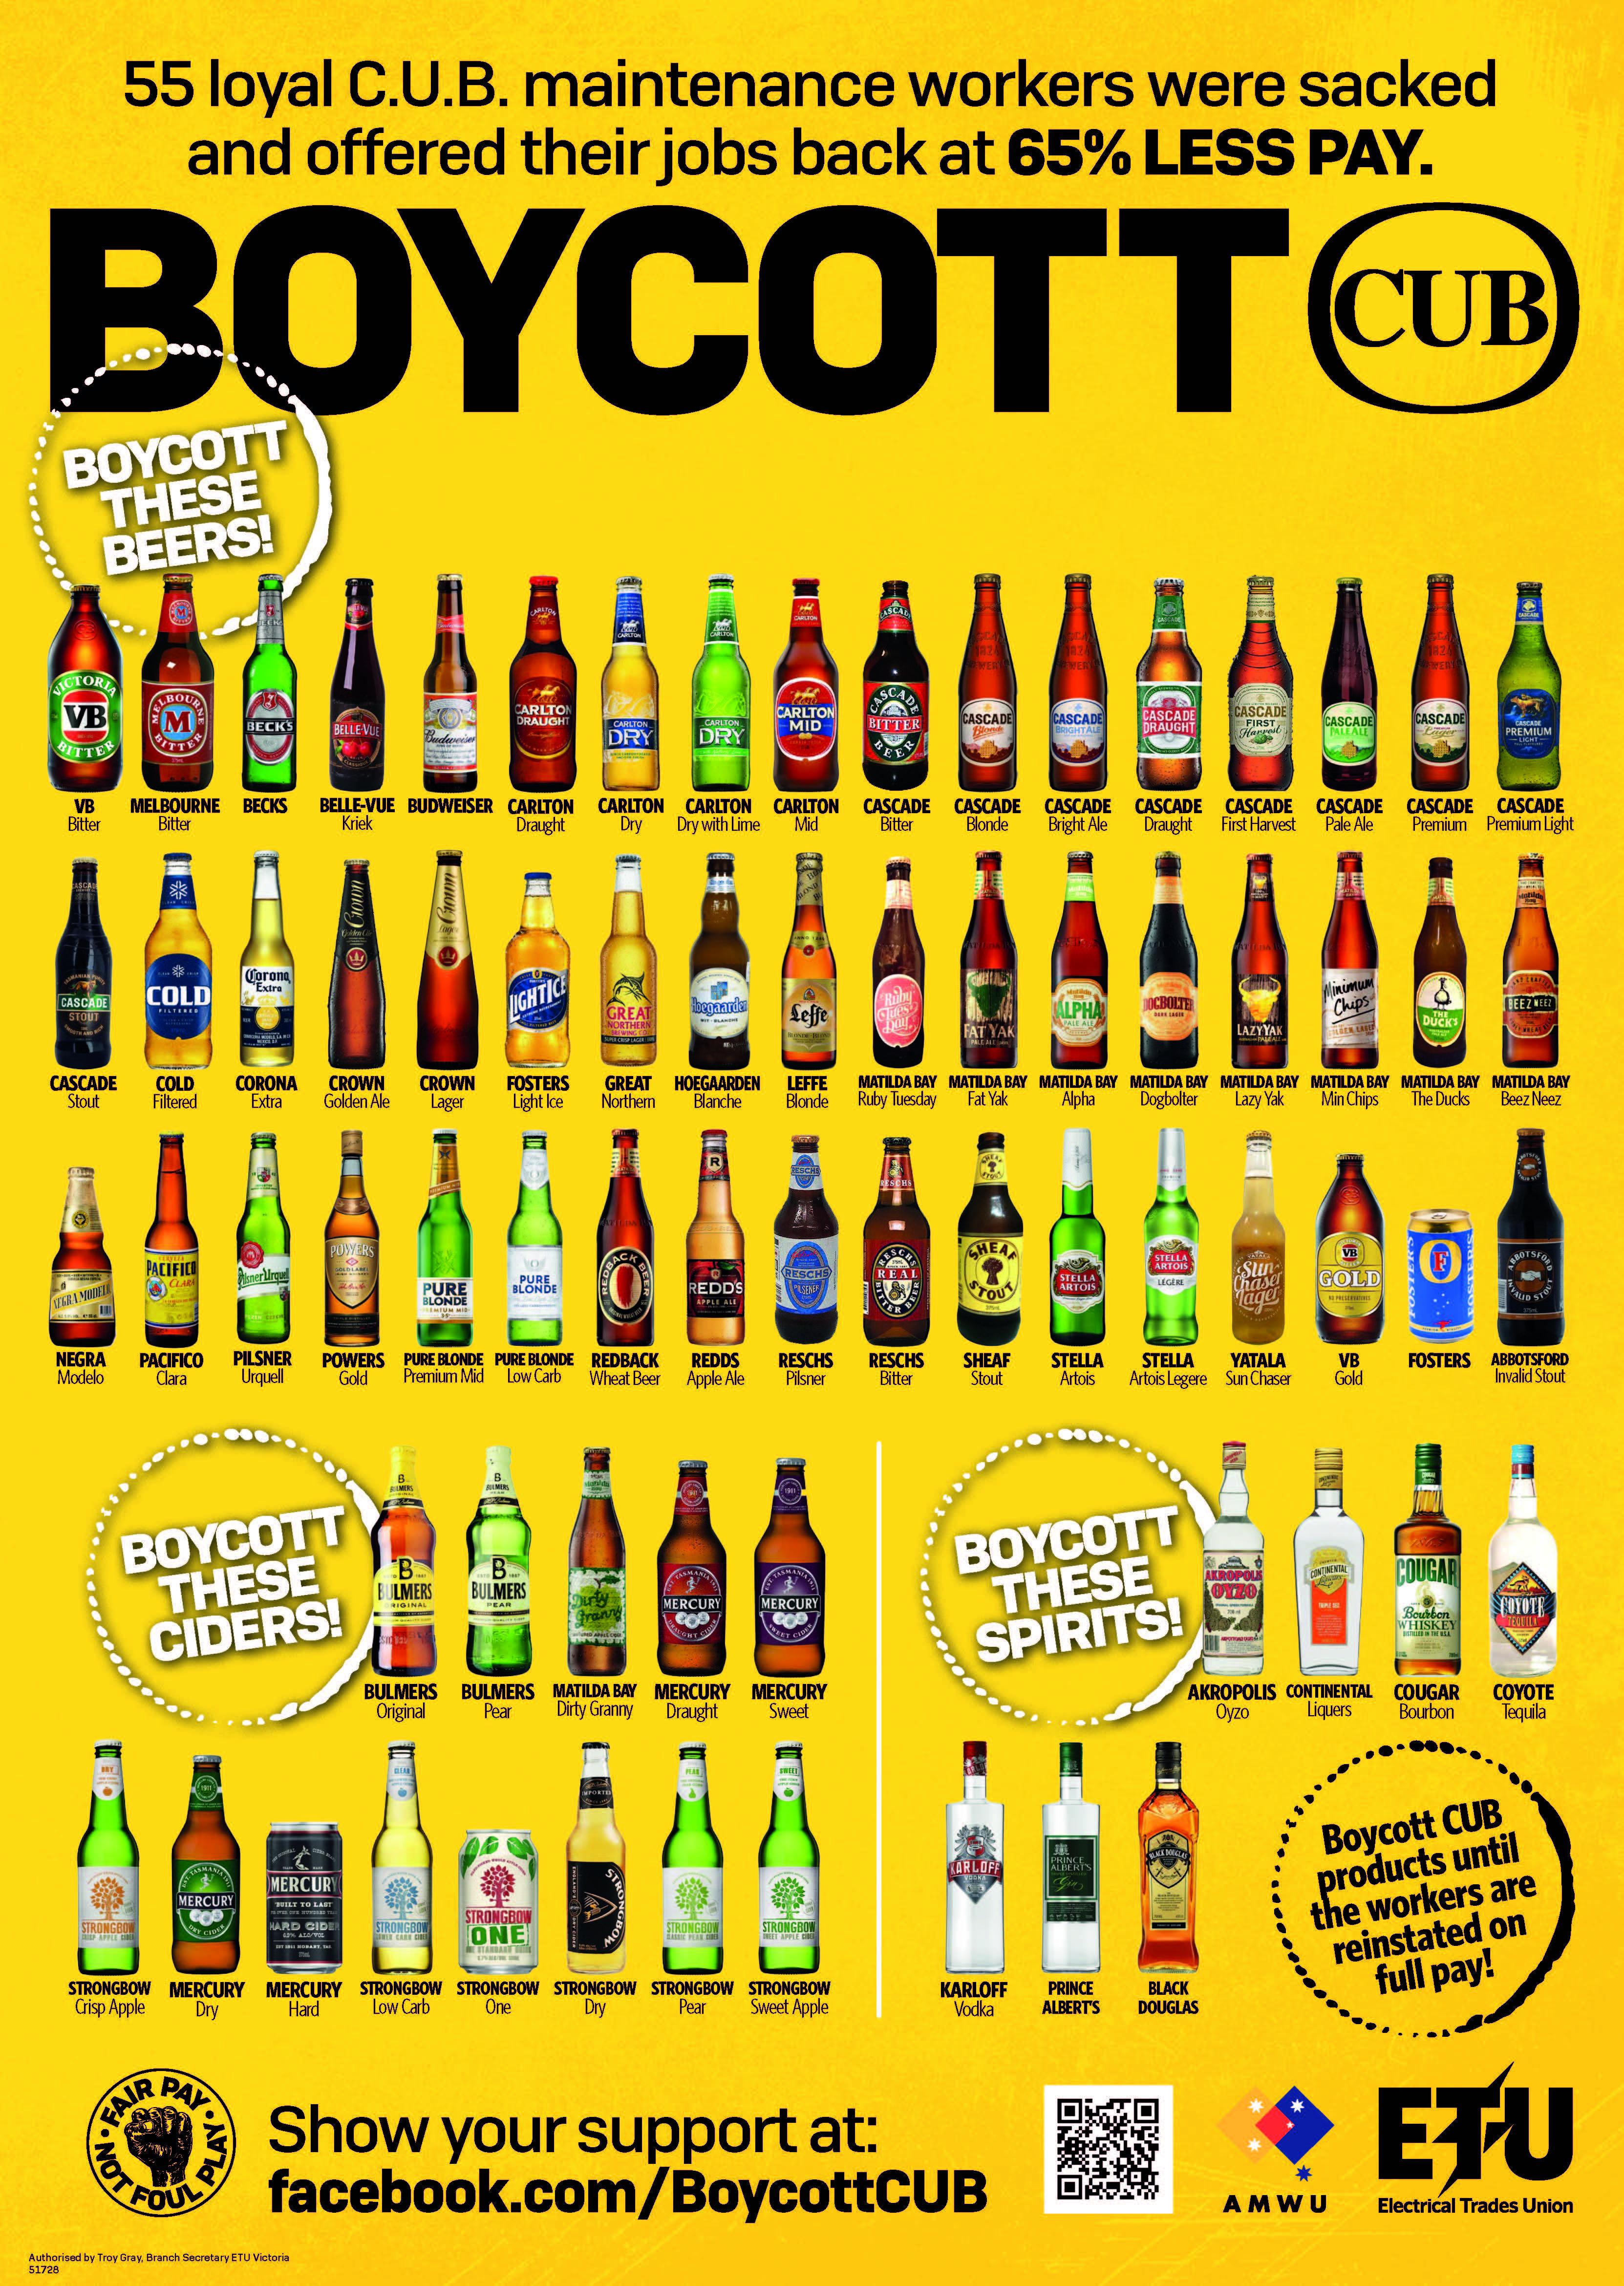 CUB-Boycott_Poster_november_A4.jpg